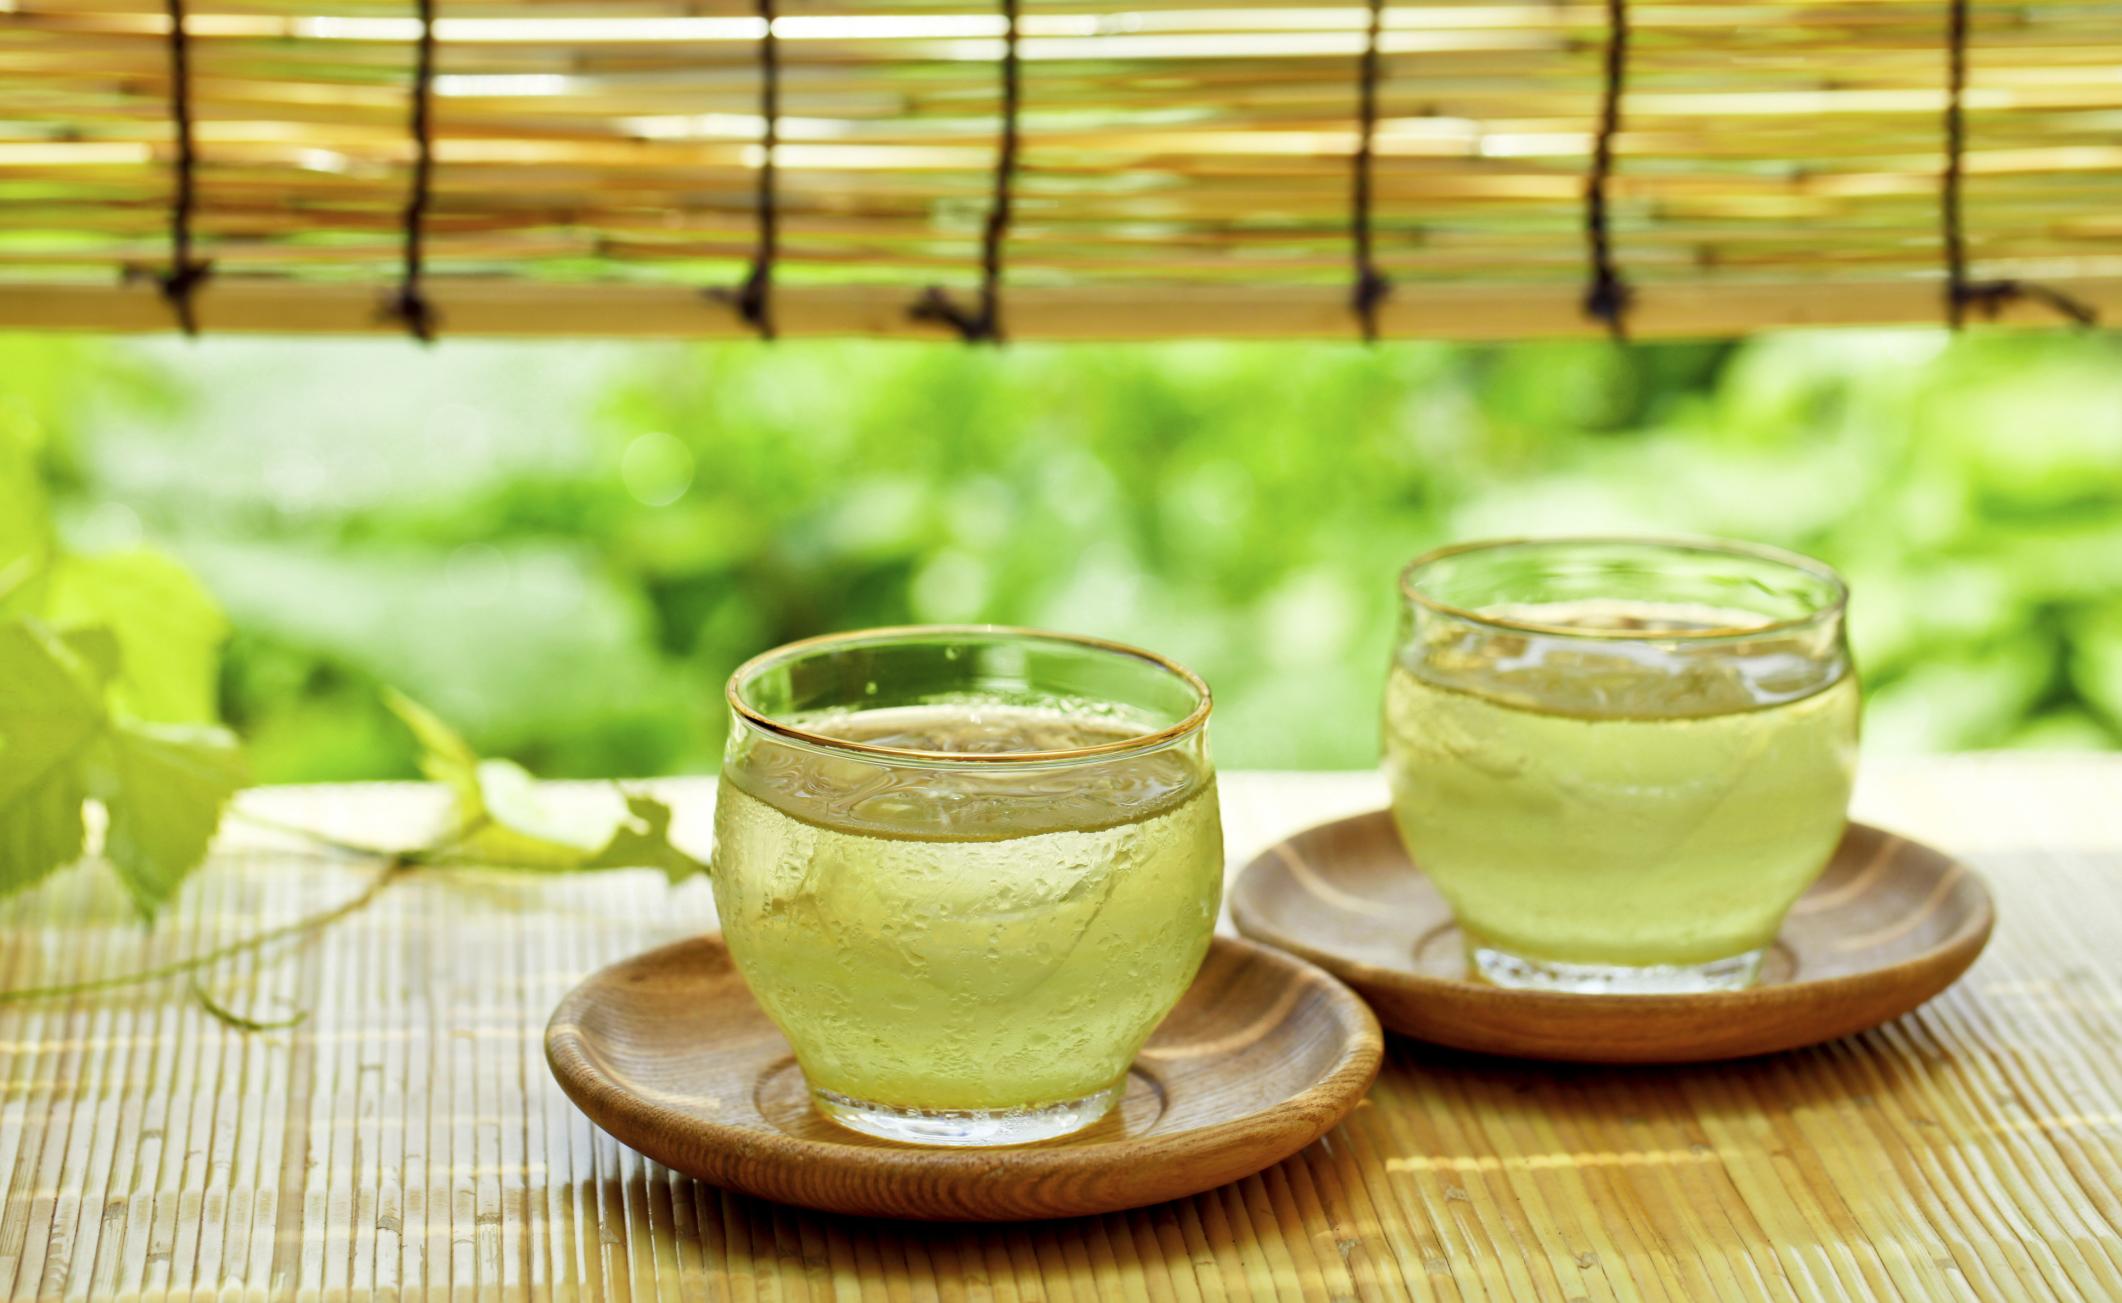 Sport e tè verde: una combinazione vincente per perdere peso